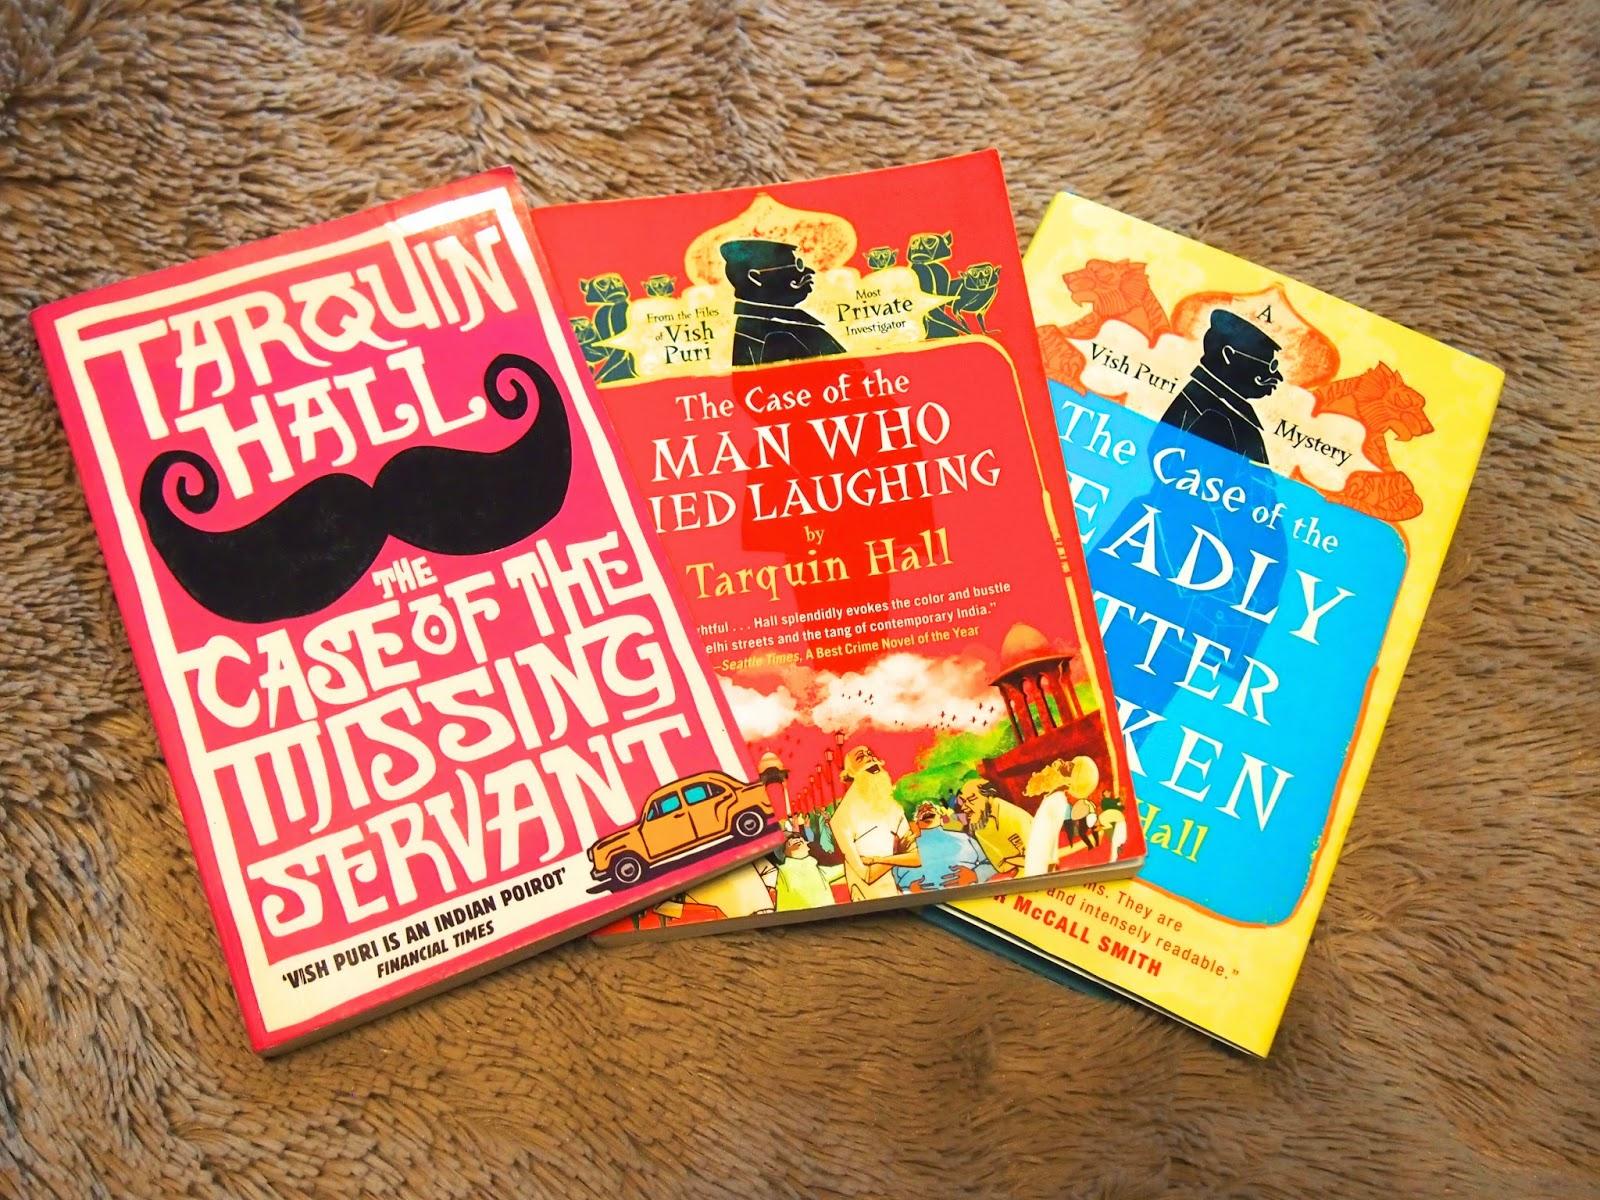 Tarquin Hall books